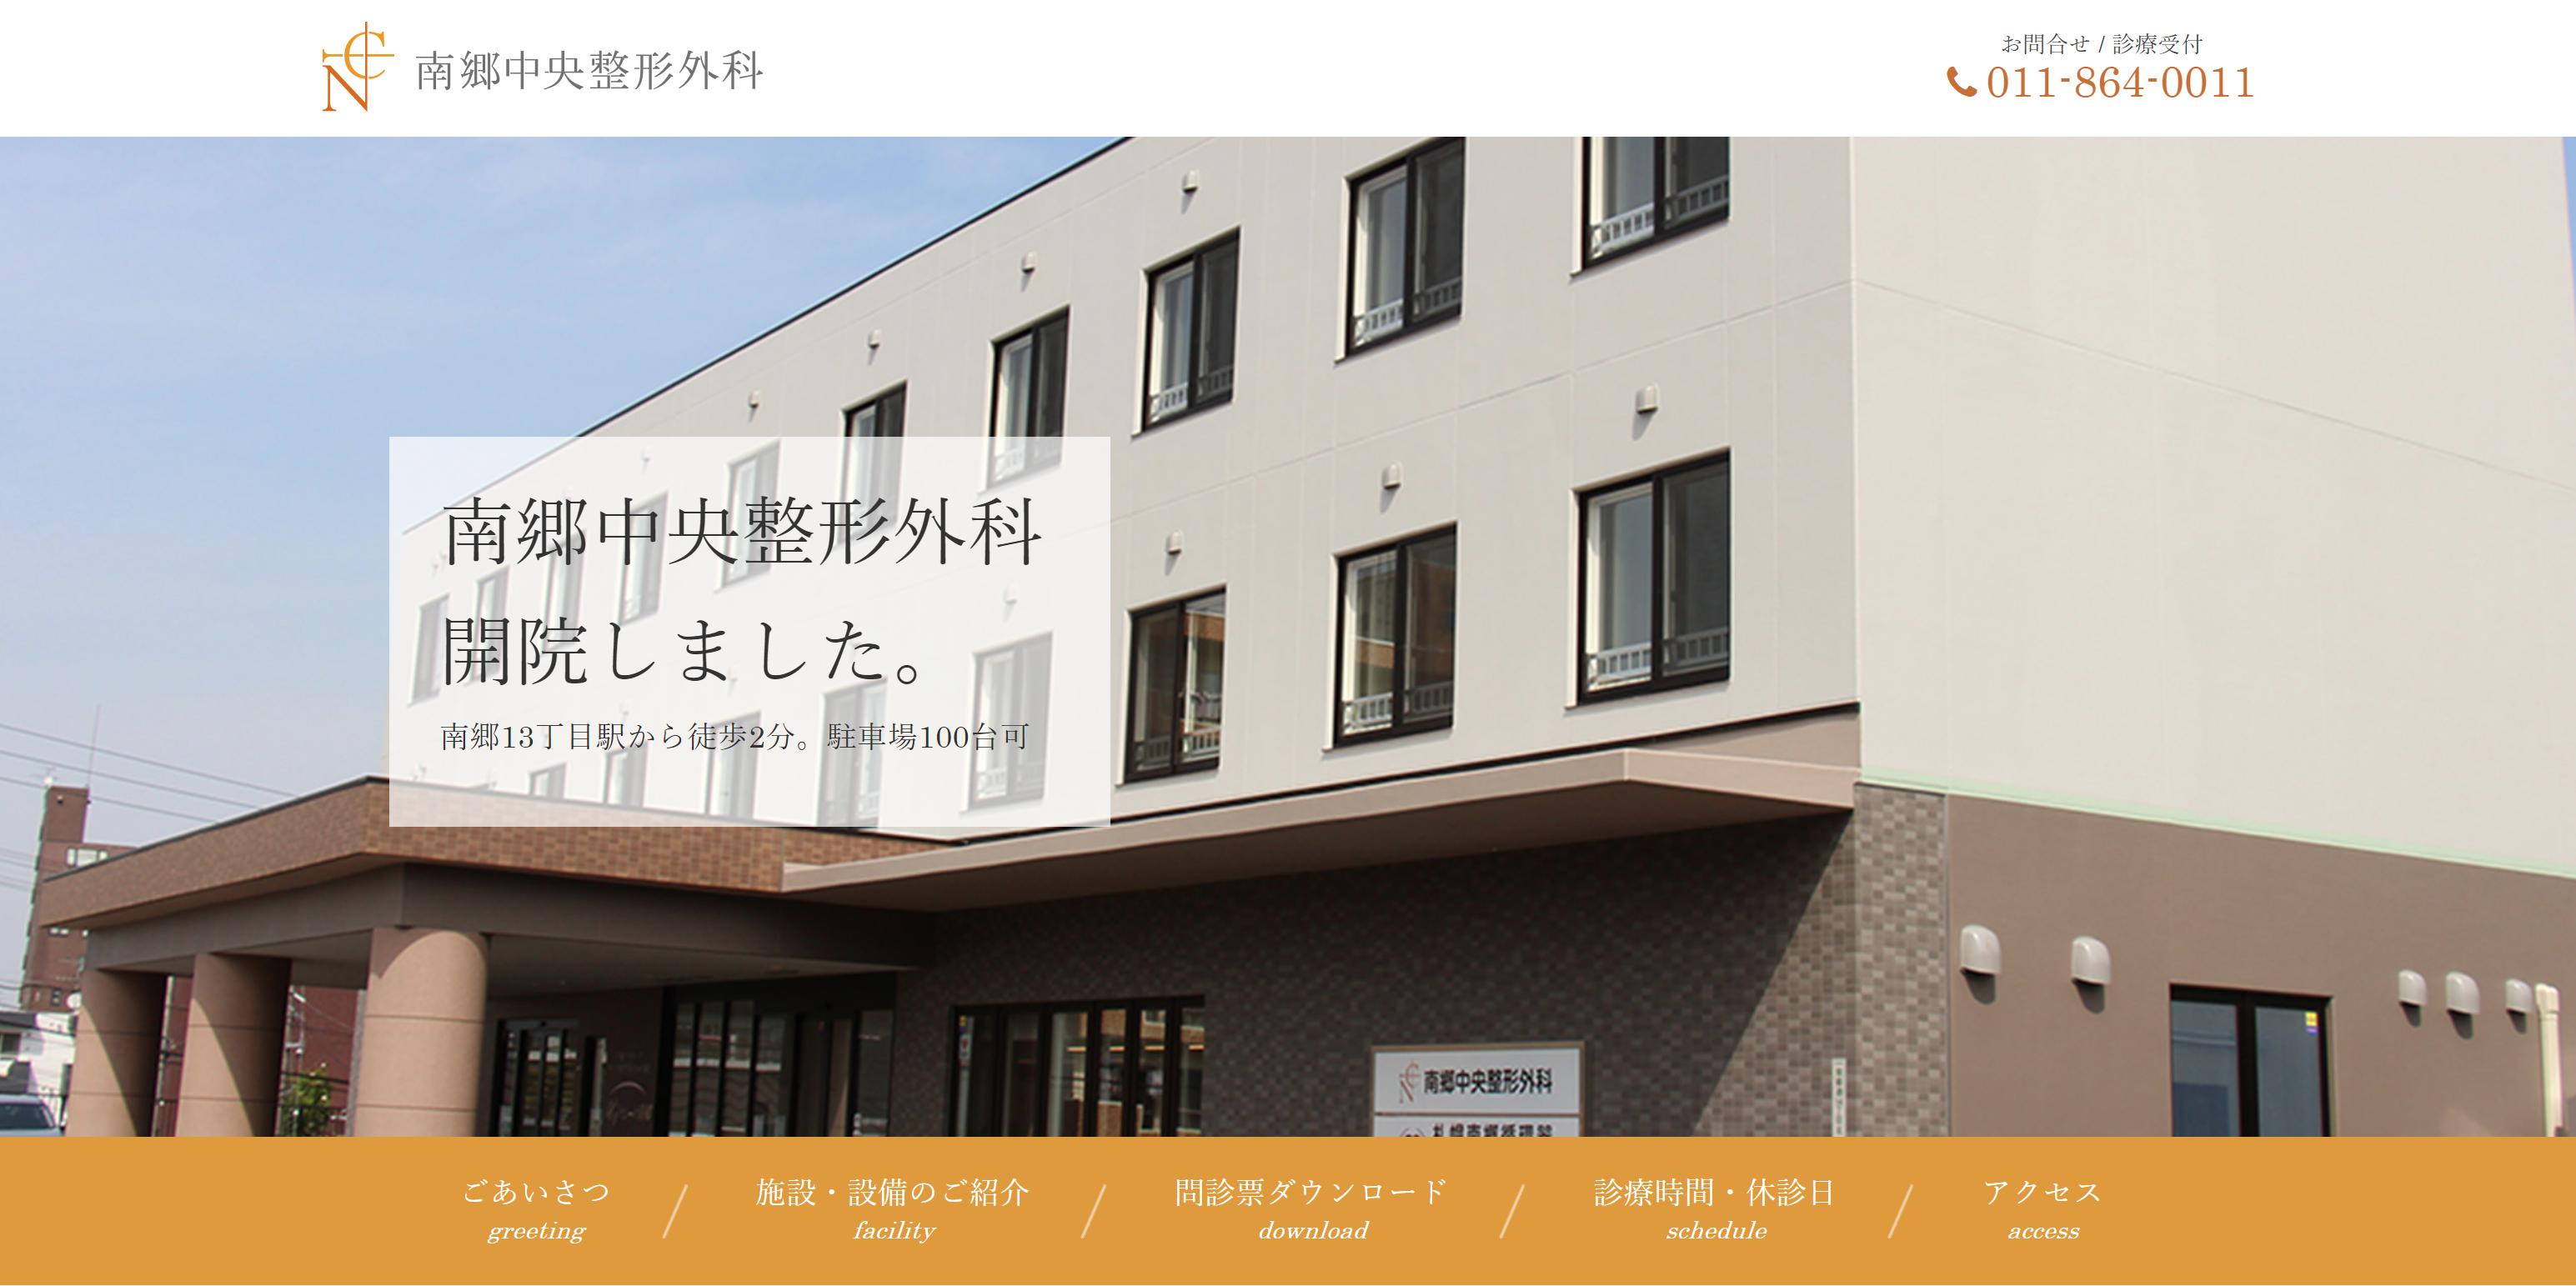 【WEB制作事例】札幌市の整形外科 南郷中央整形外科